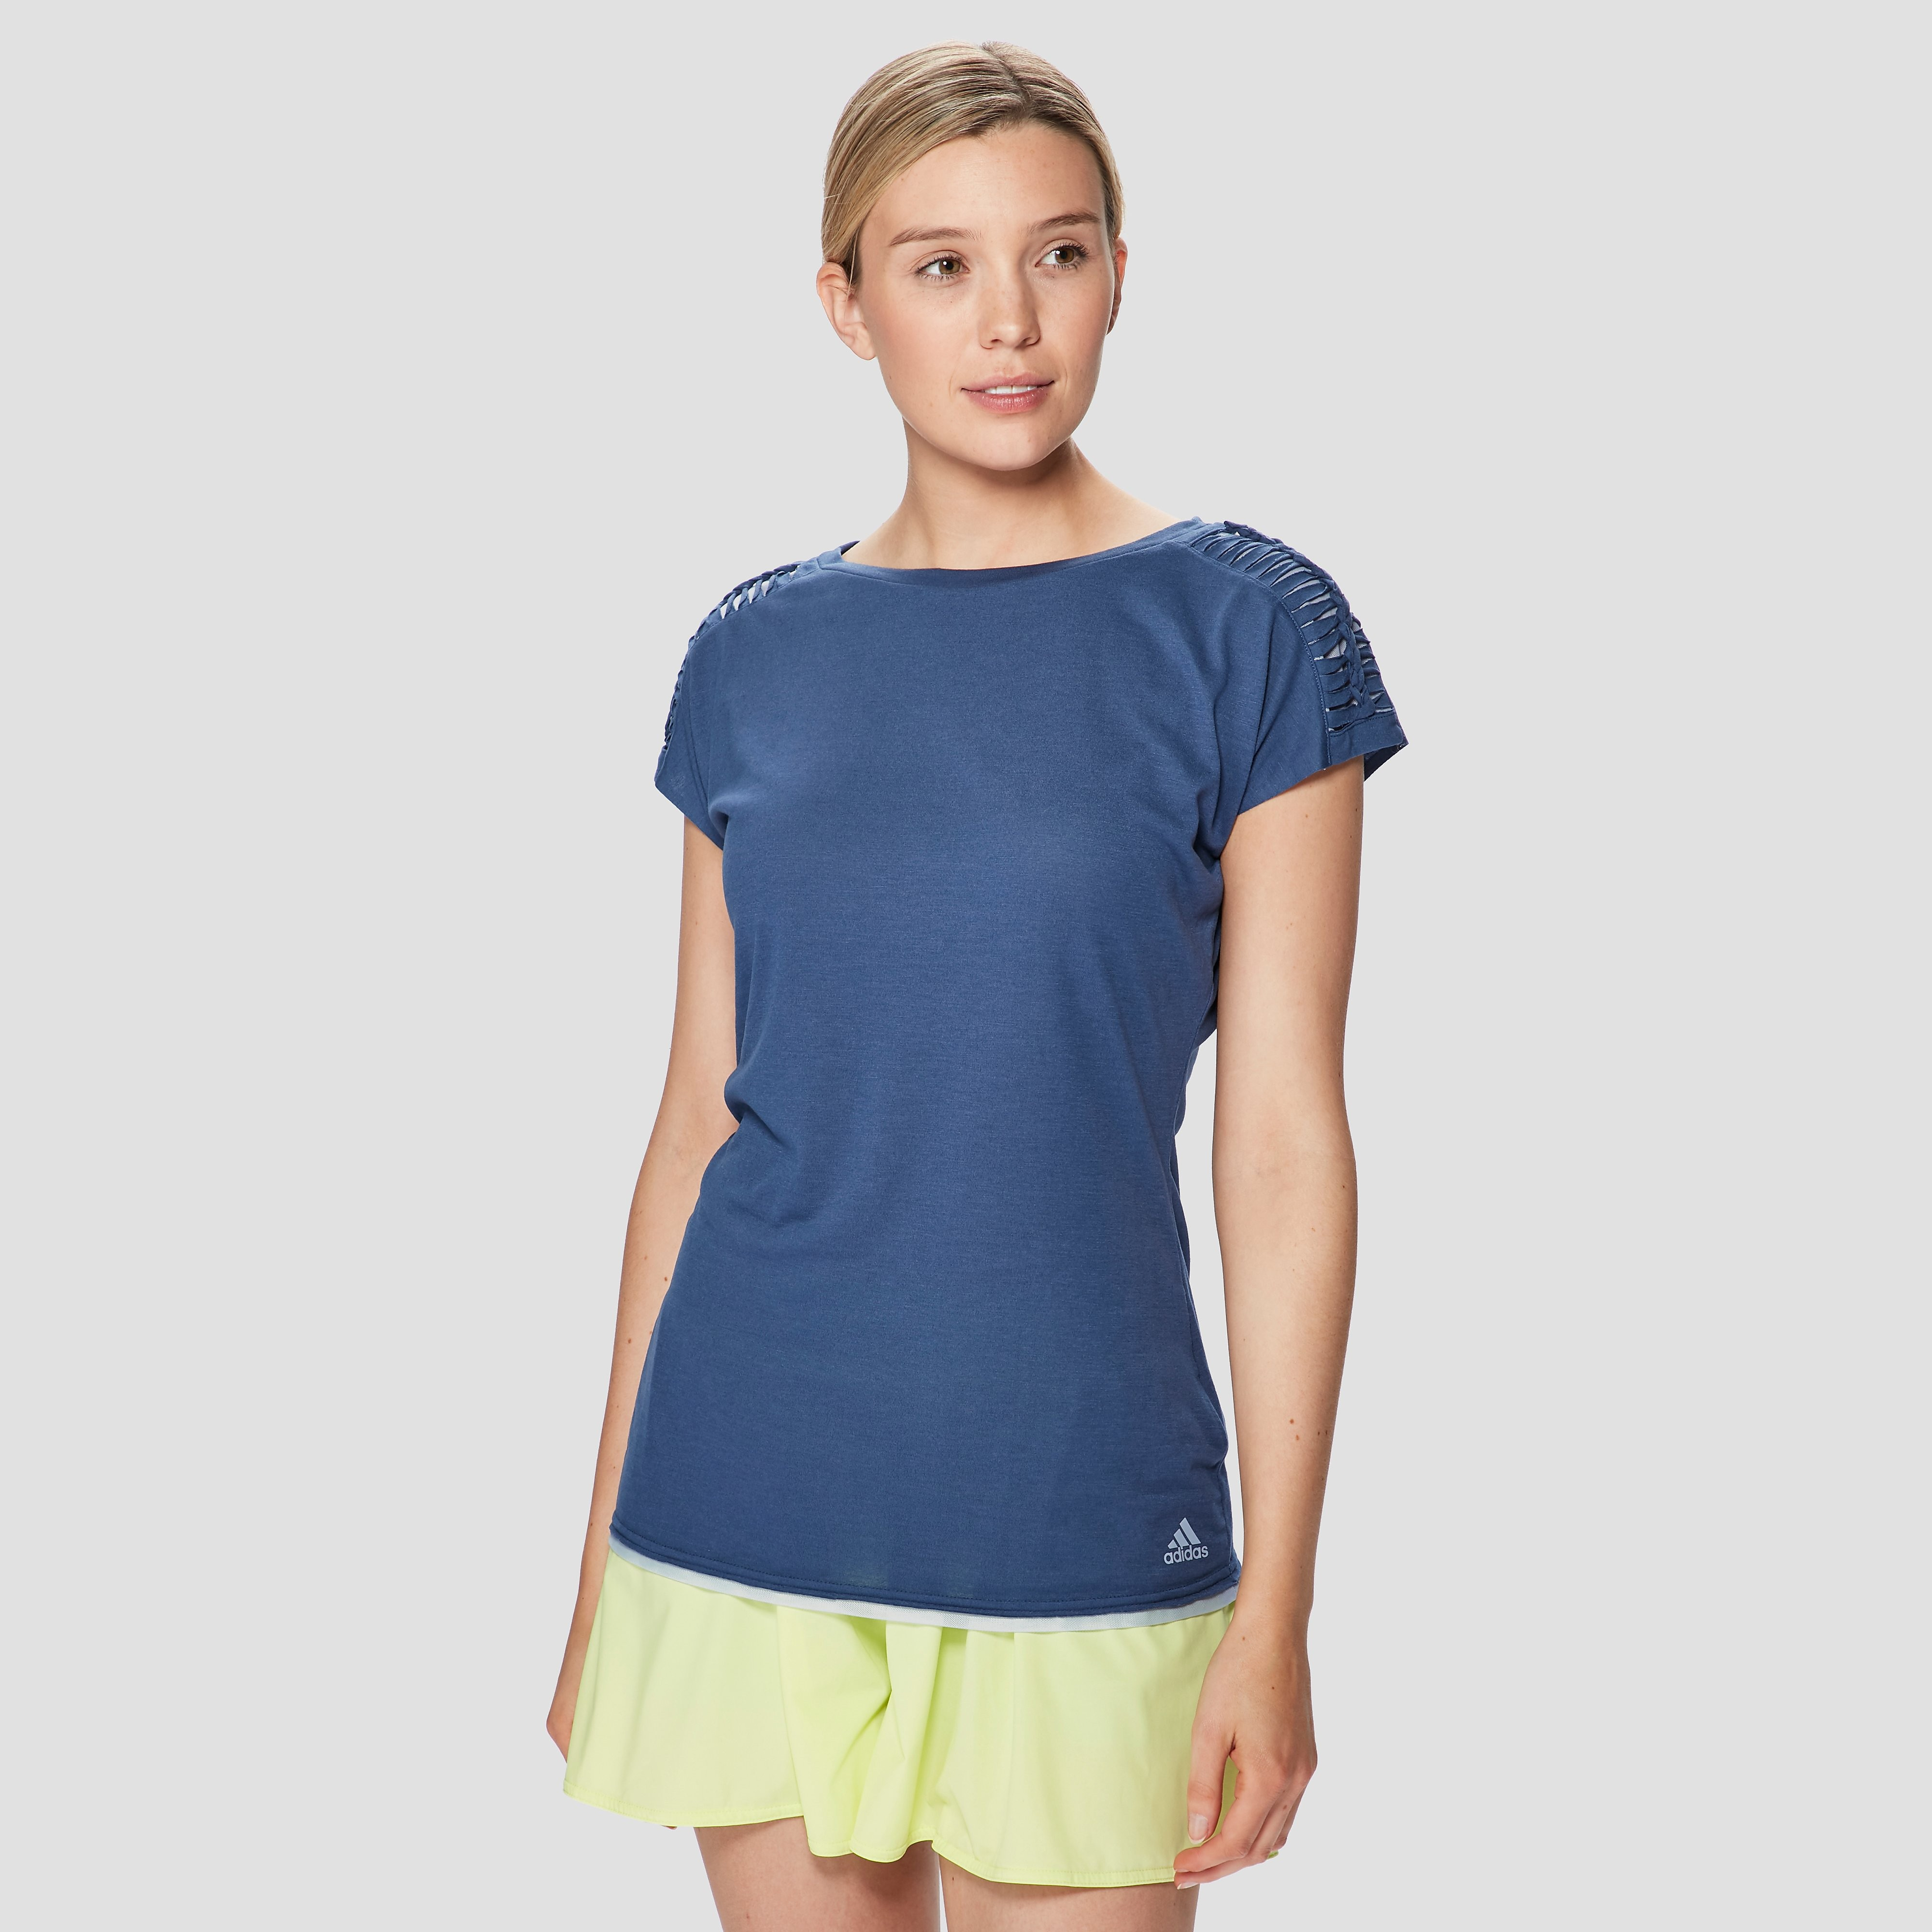 adidas Melbourne Line Women's Tennis T-Shirt